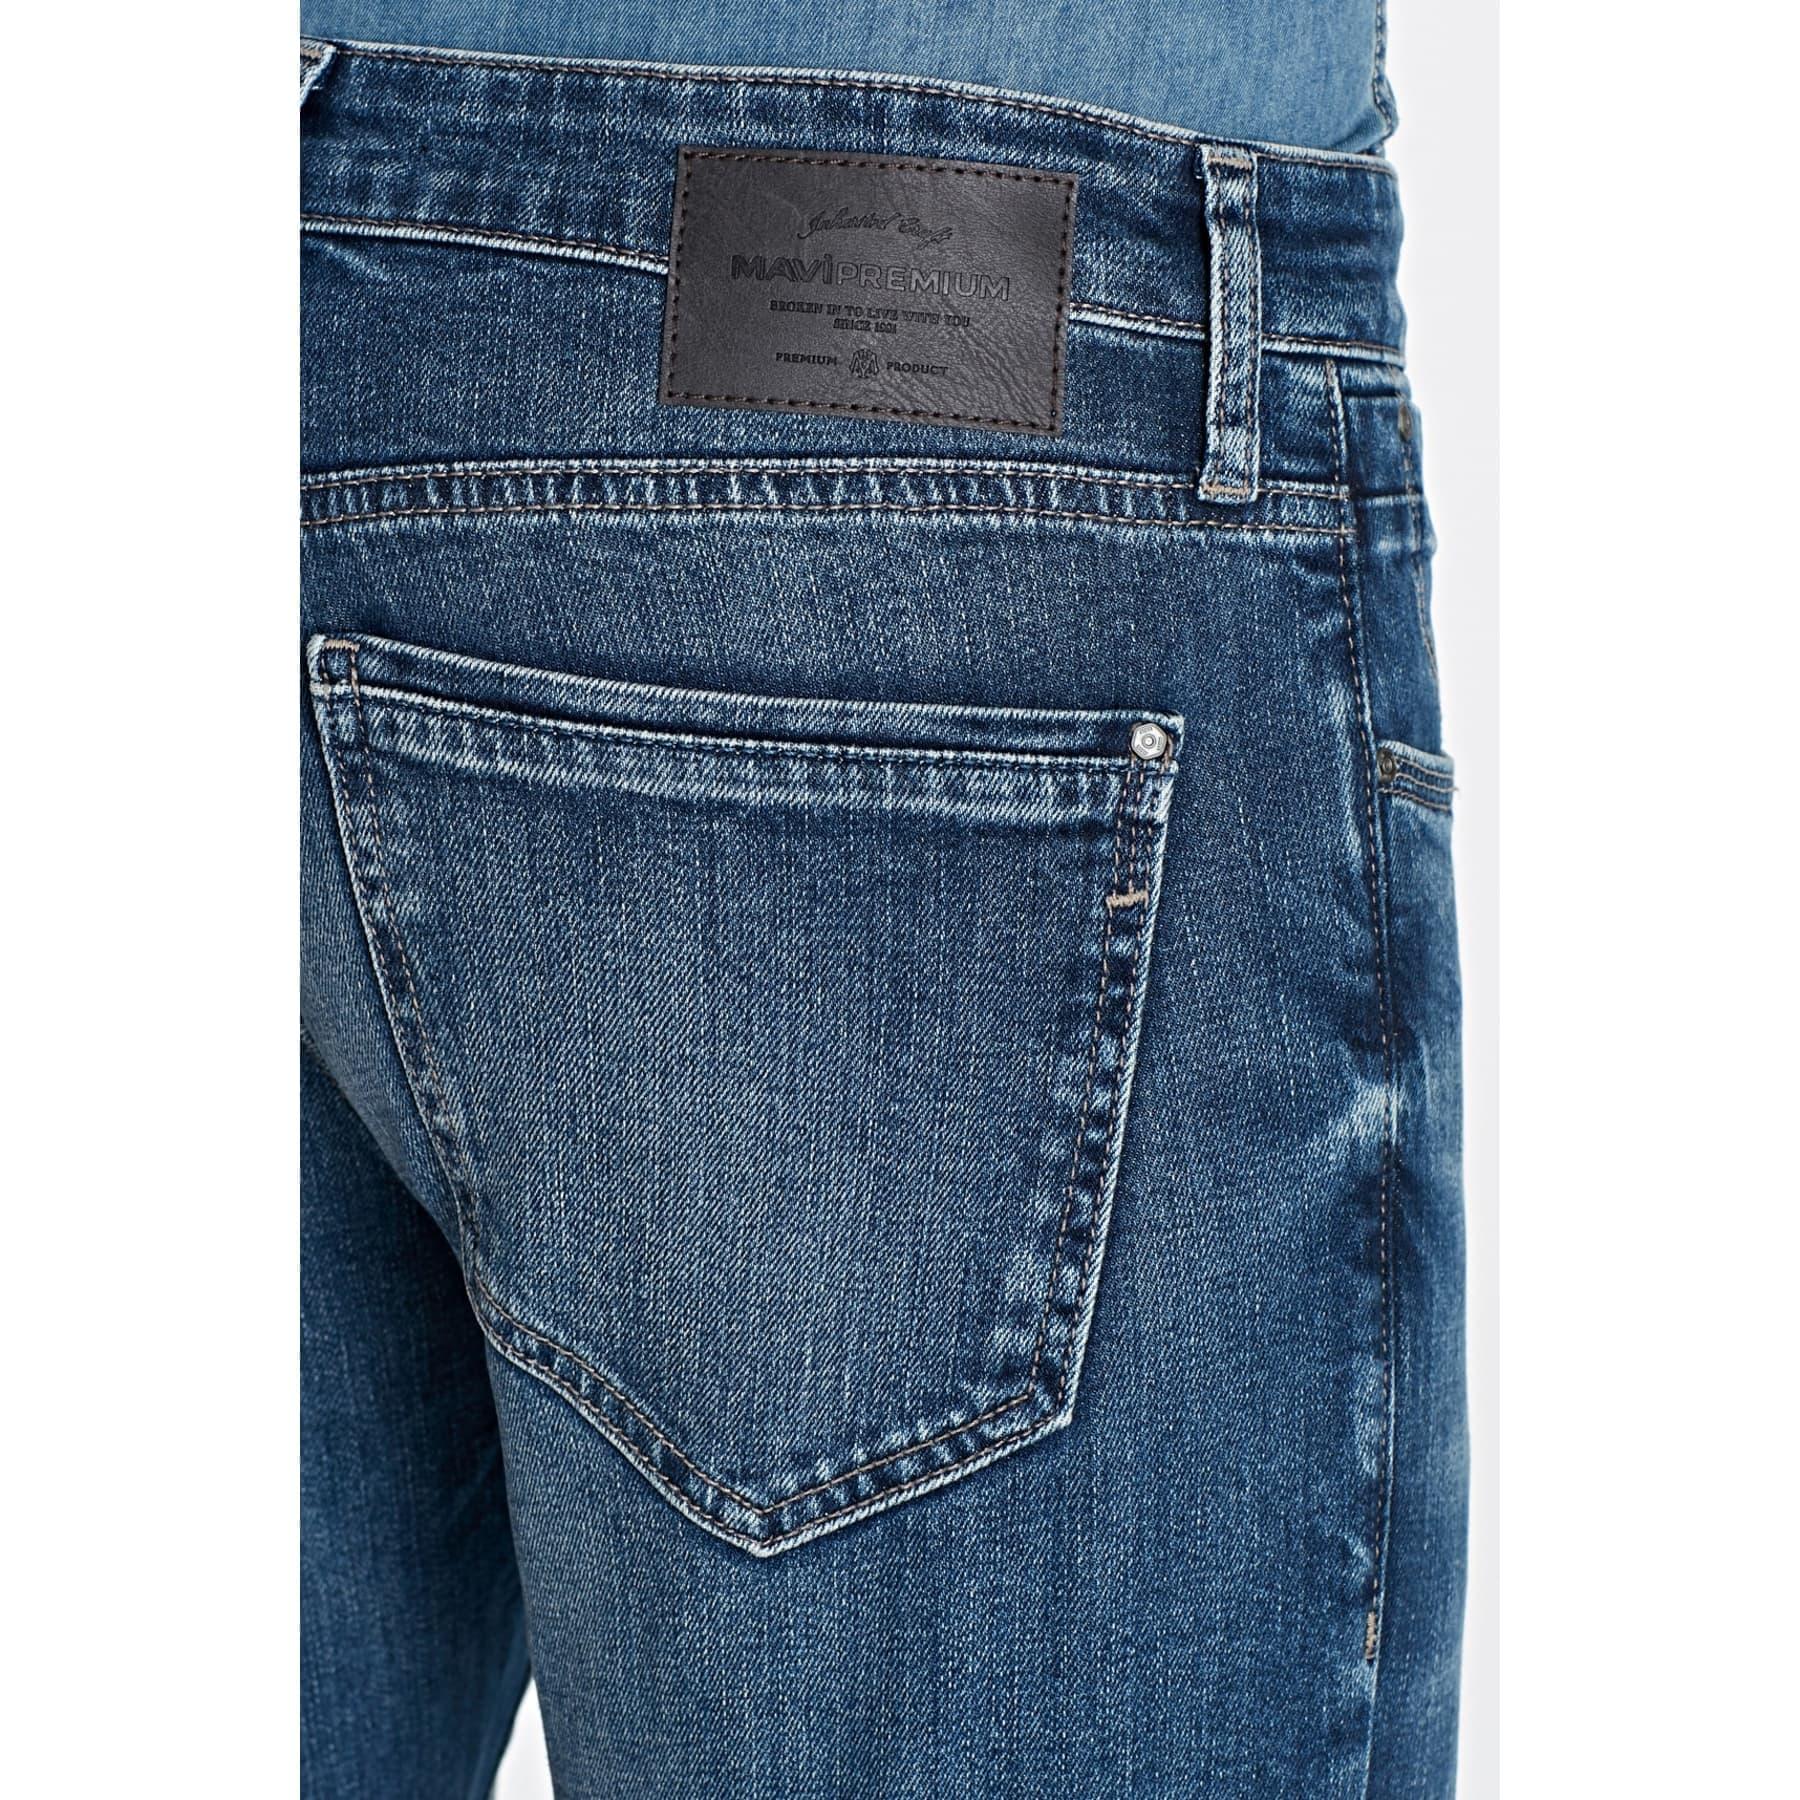 Jake Mavi Premium Vintage Jean Pantolon